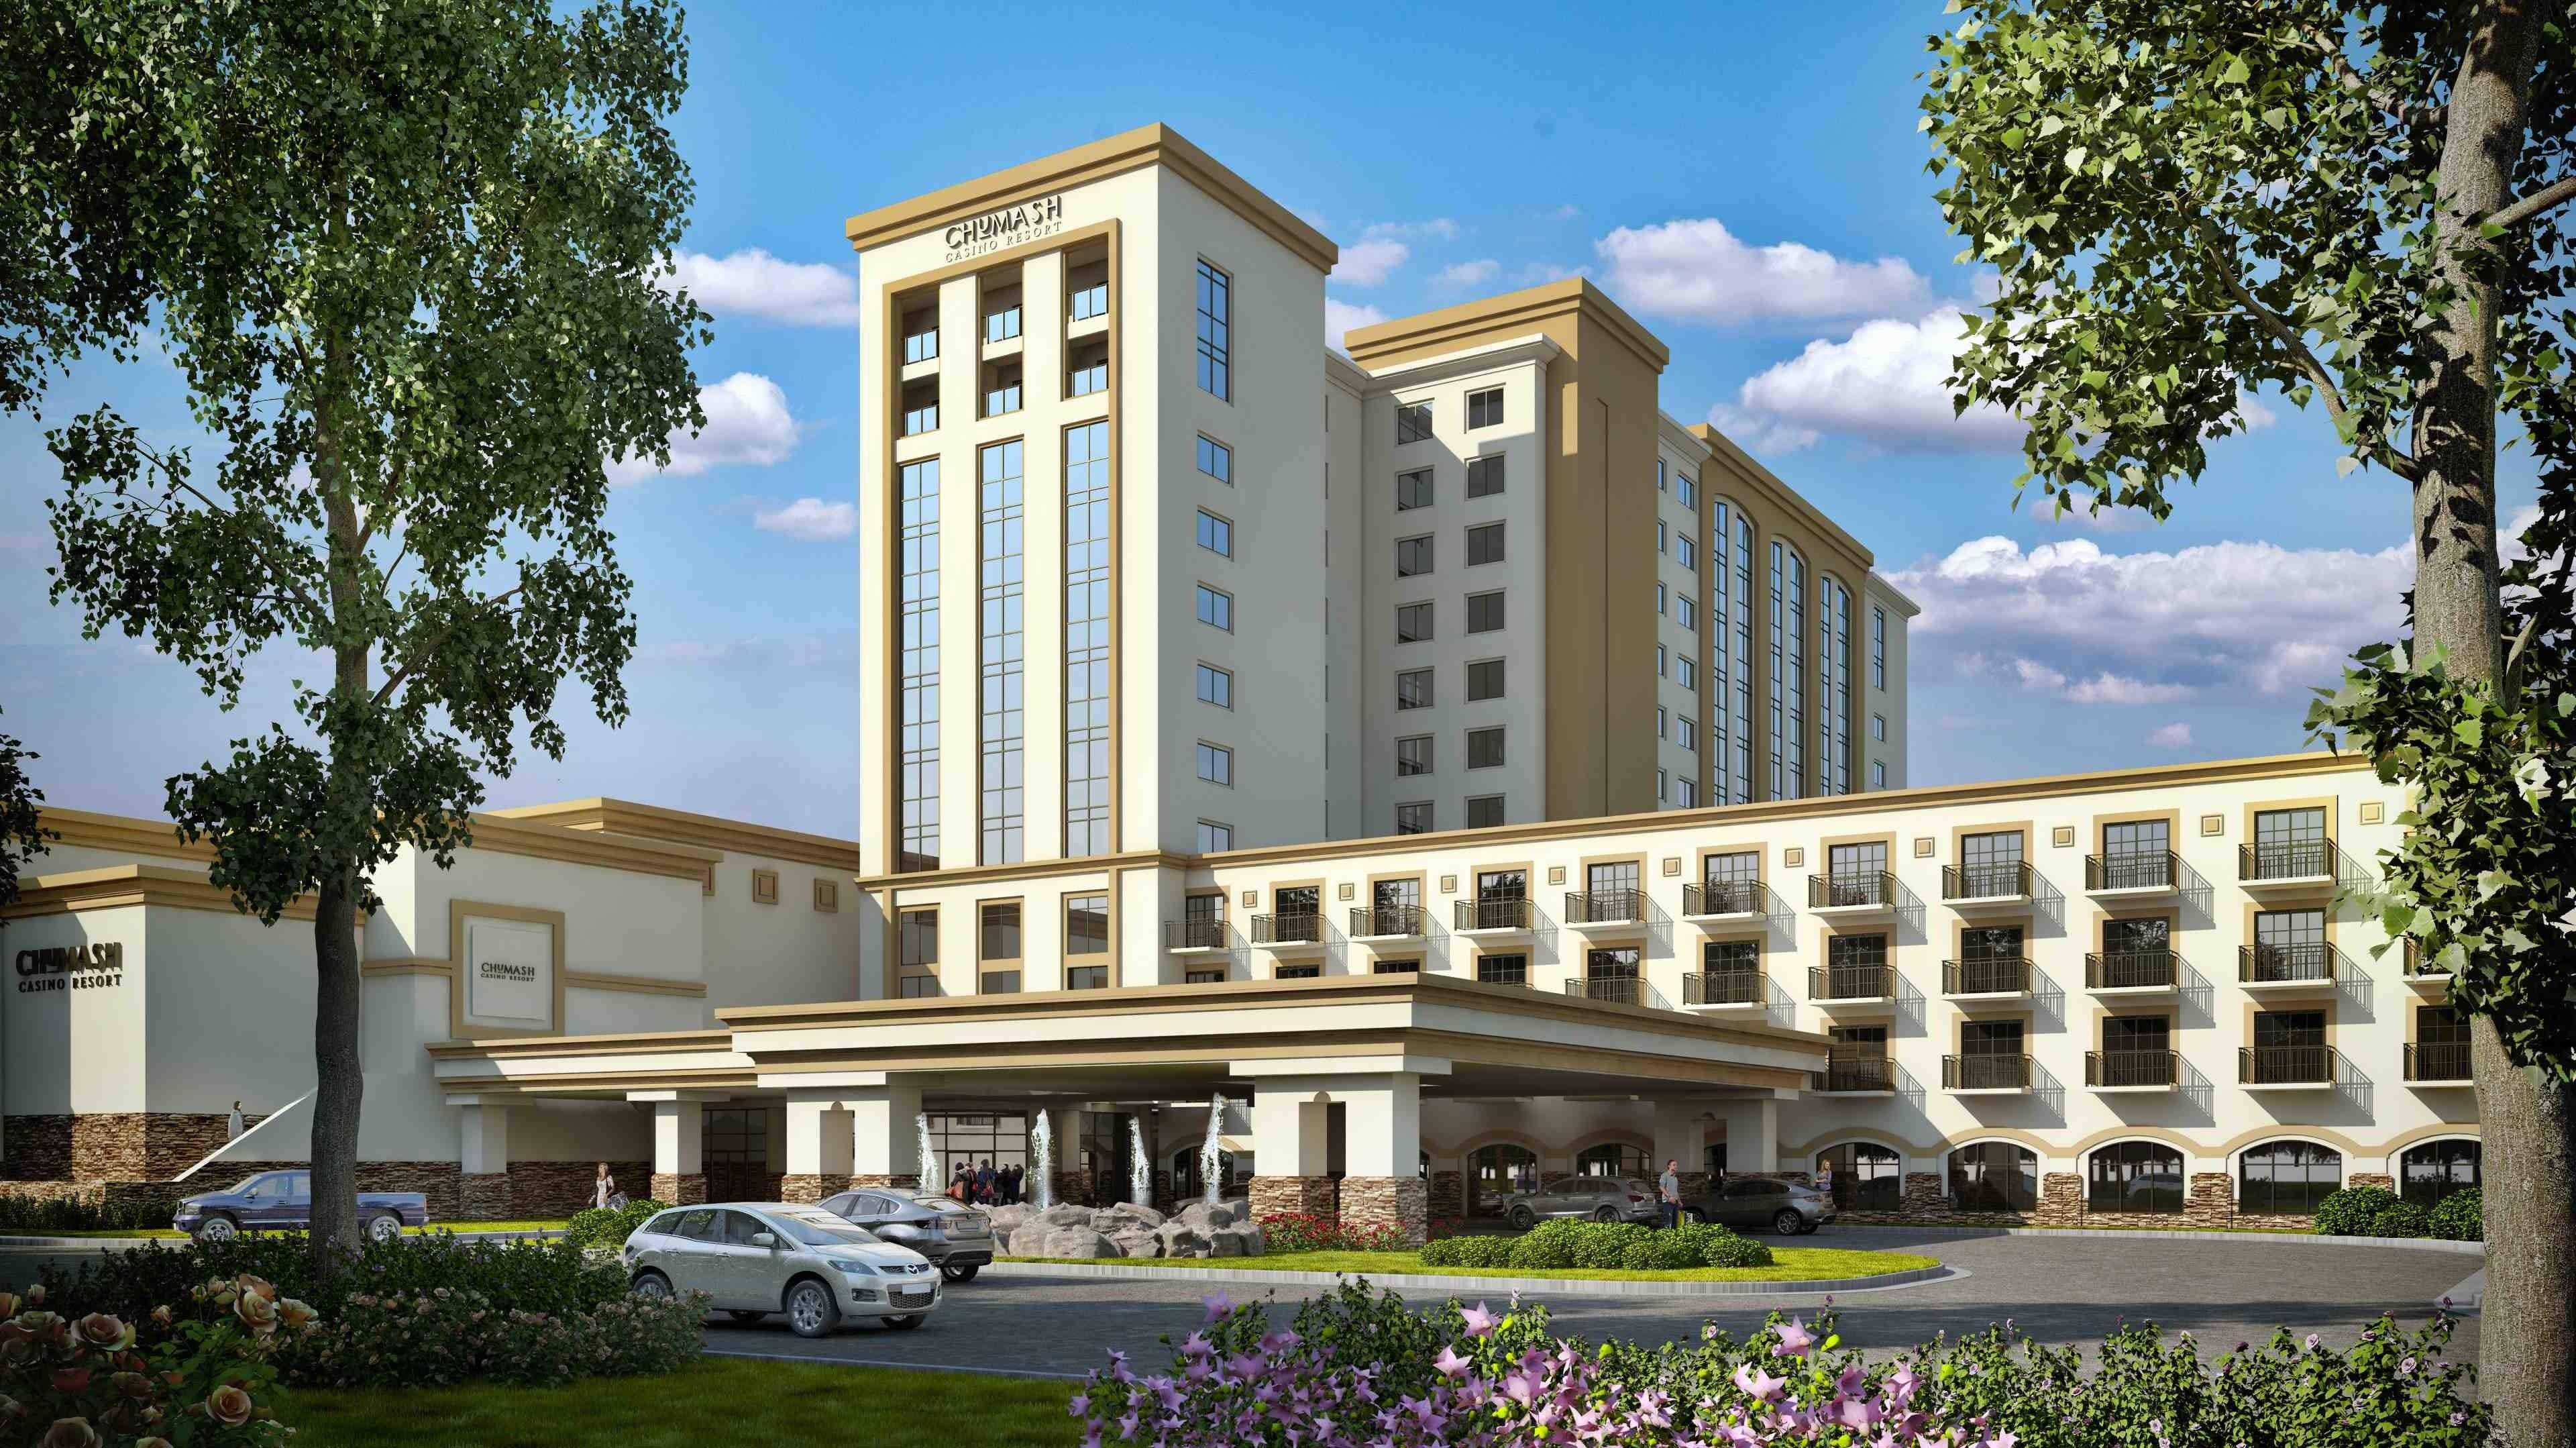 Chumash casino resort hotel lucky lady hotel casino